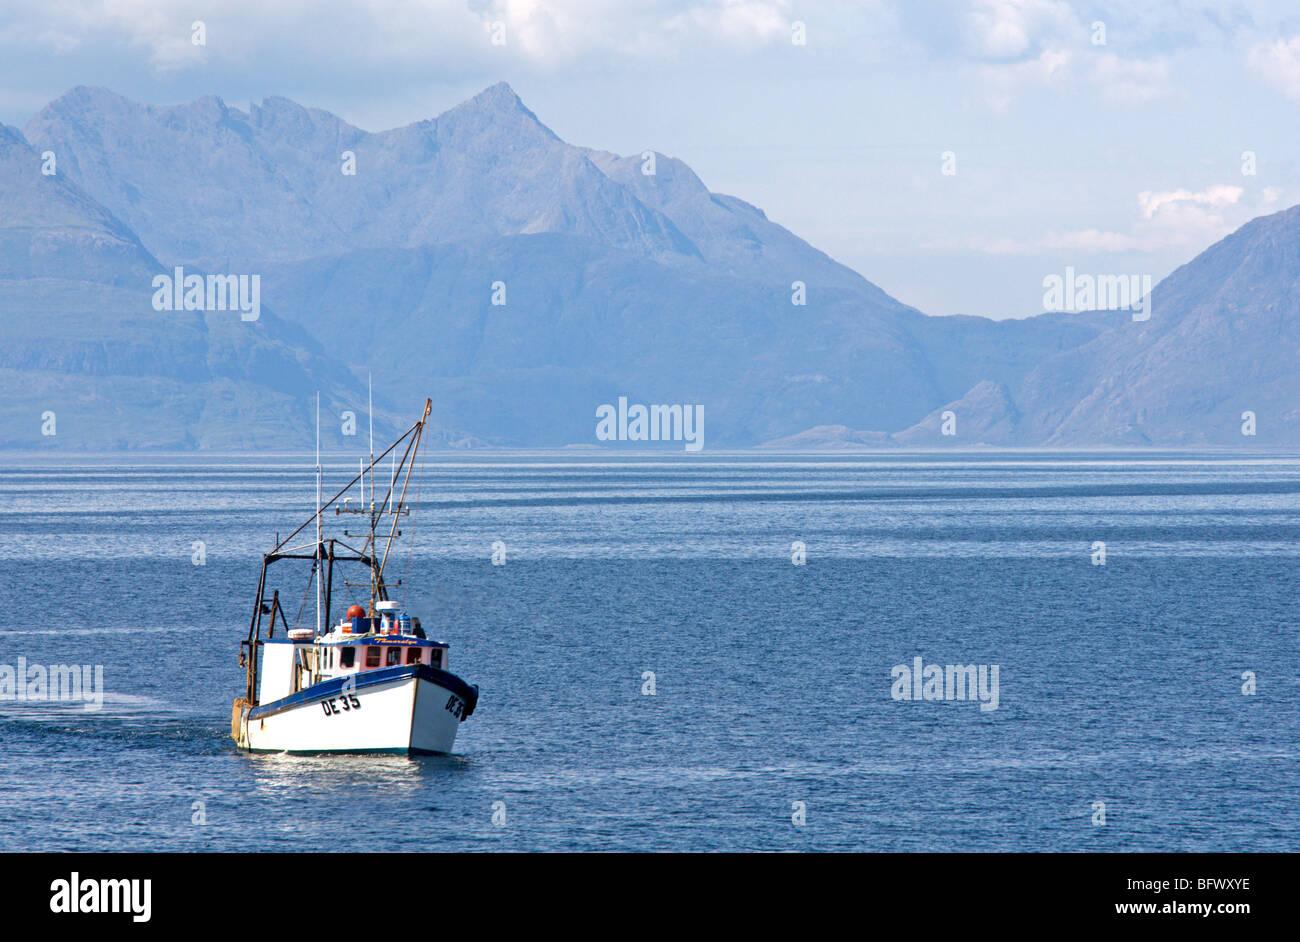 Fishing Vessel DE35 Tamaralyn fishing the Inner Hebrides Stock Photo